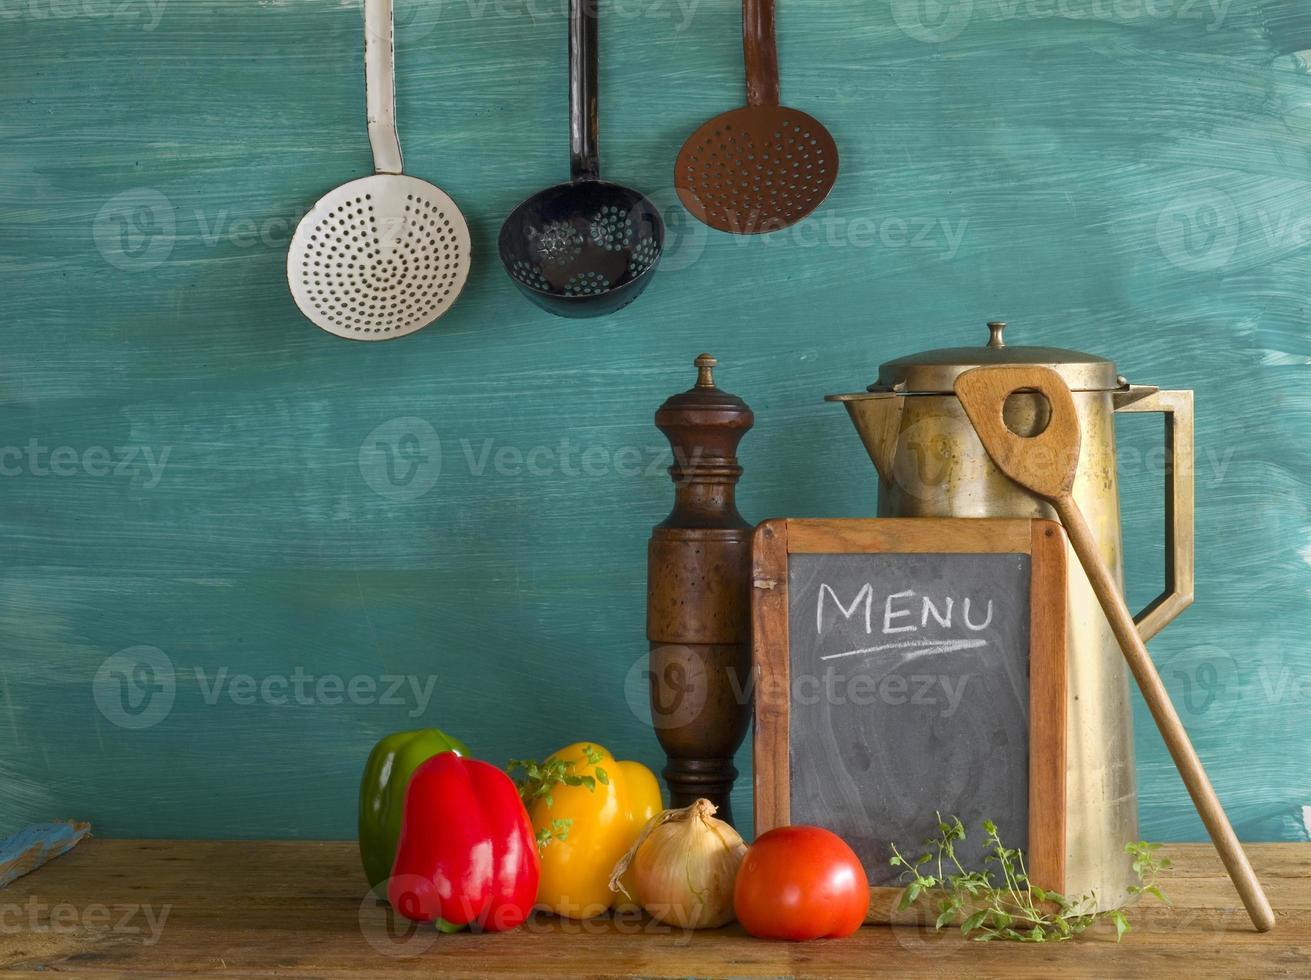 Menü w. Lebensmittelzutaten, Kochrezepte foto